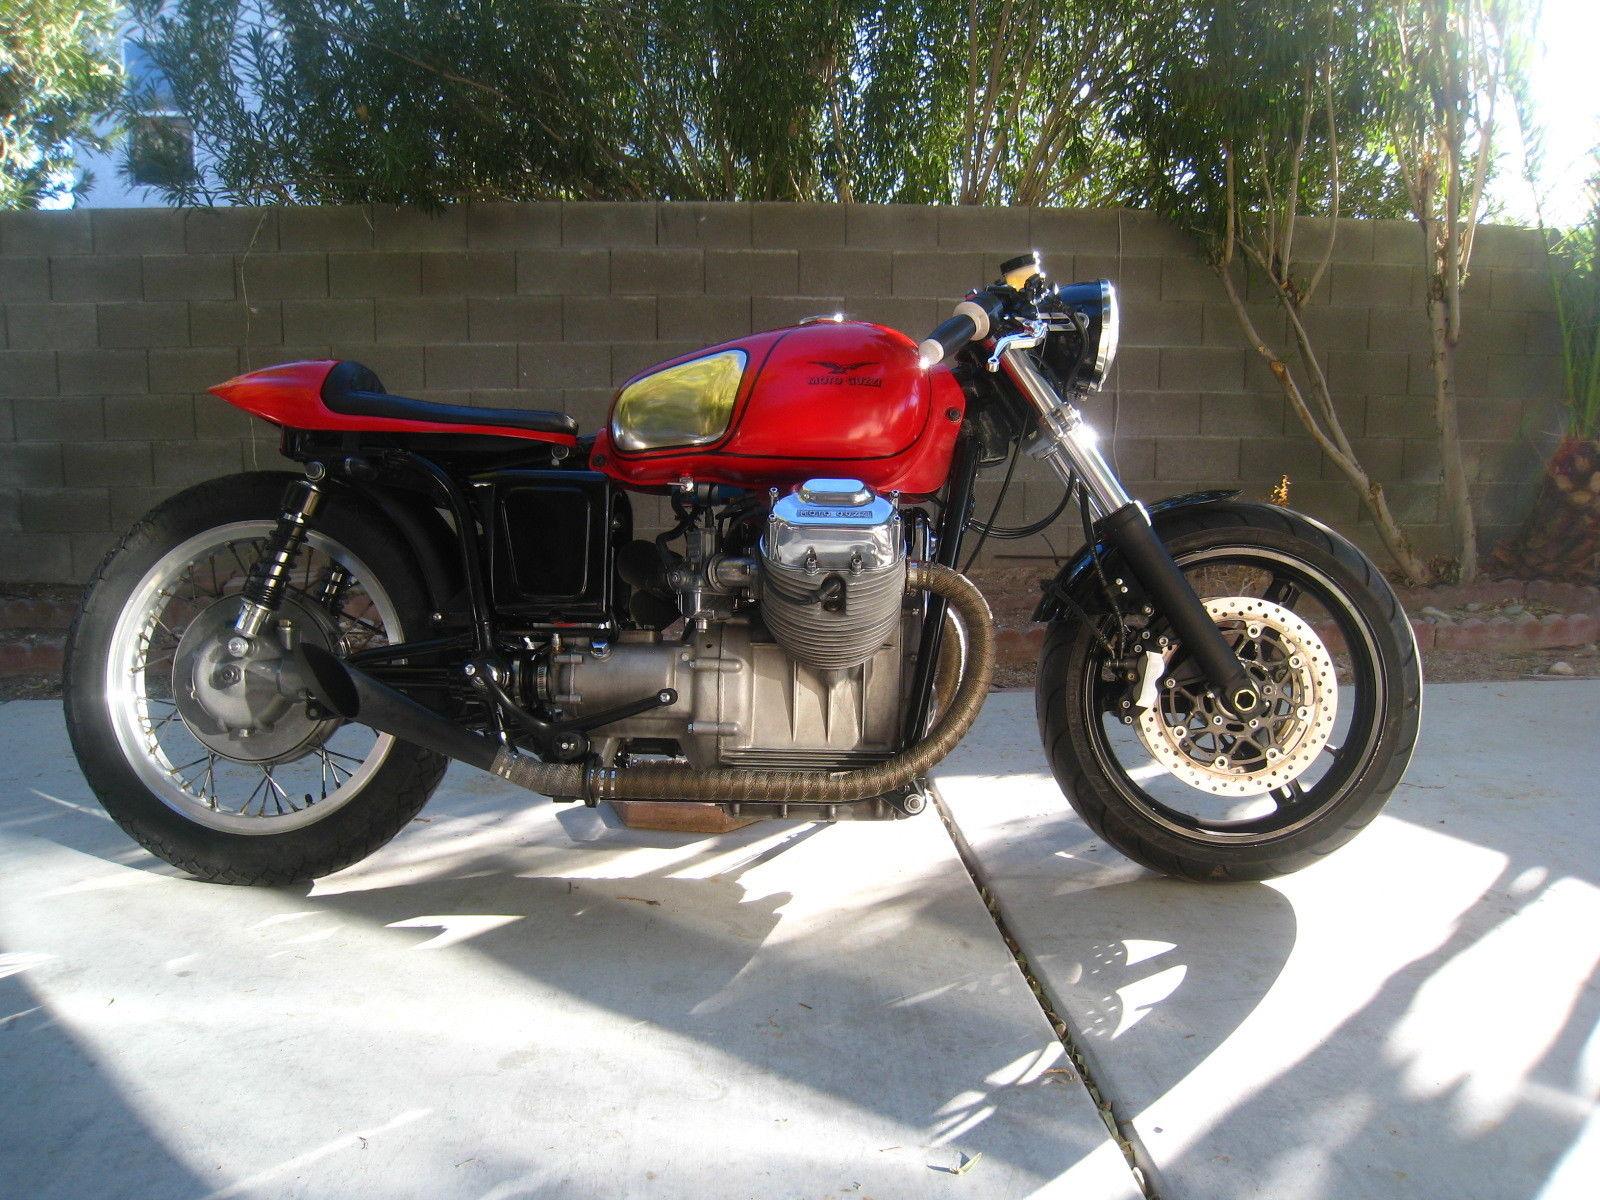 Moto Guzzi V700 Cafe Racer